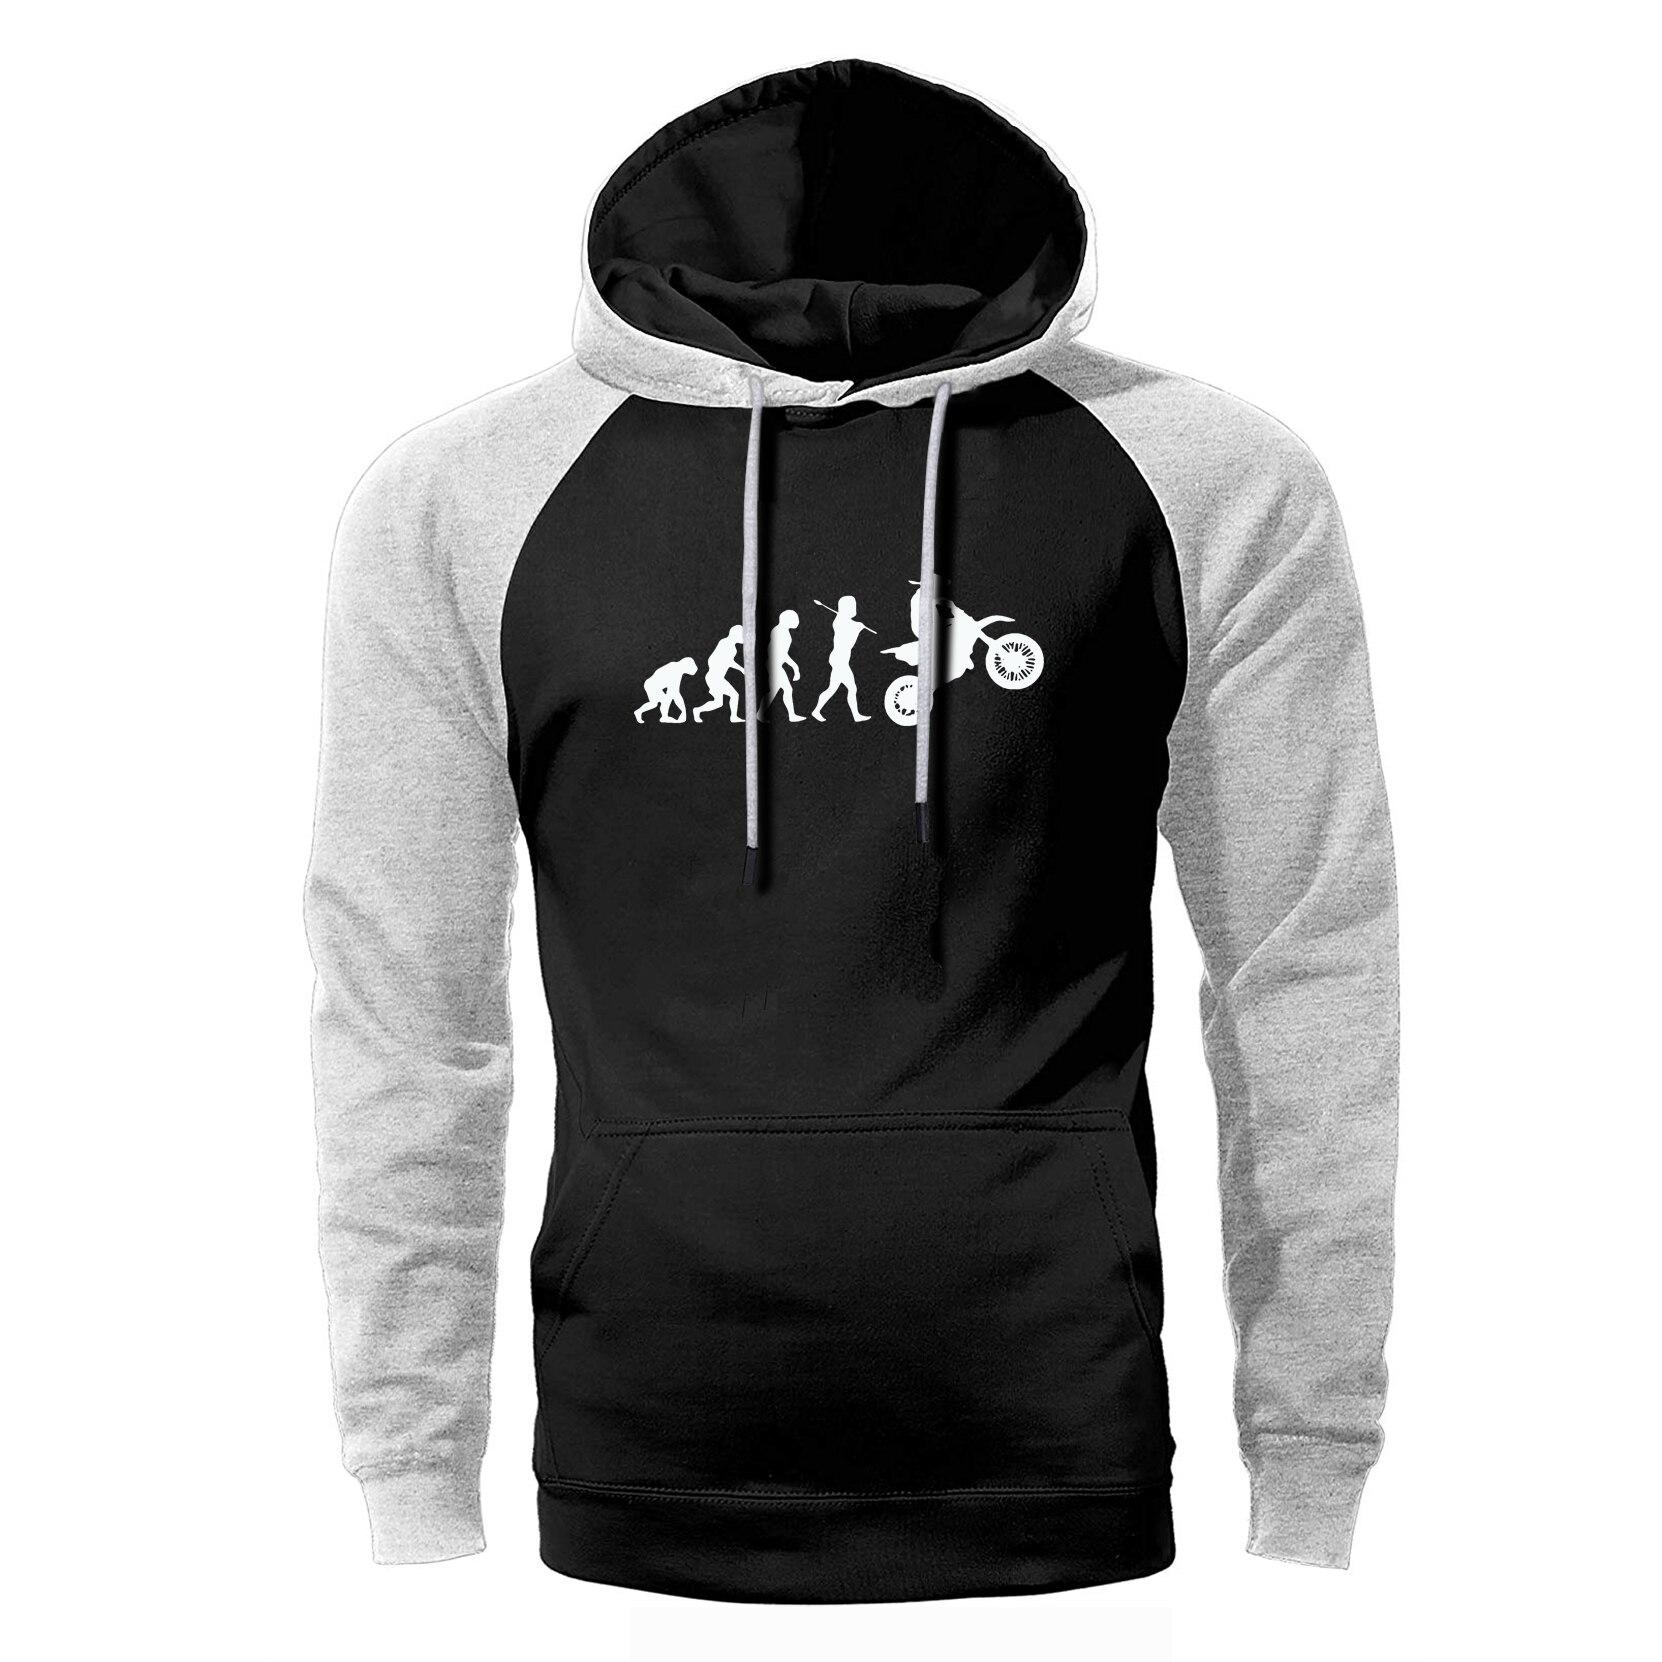 Dirtbike Evolution Motocross Hoodie Men Hipster Raglan Streetwear Sweatshirts 2019 Spring Autumn Fleece Warm Loose Sportswear